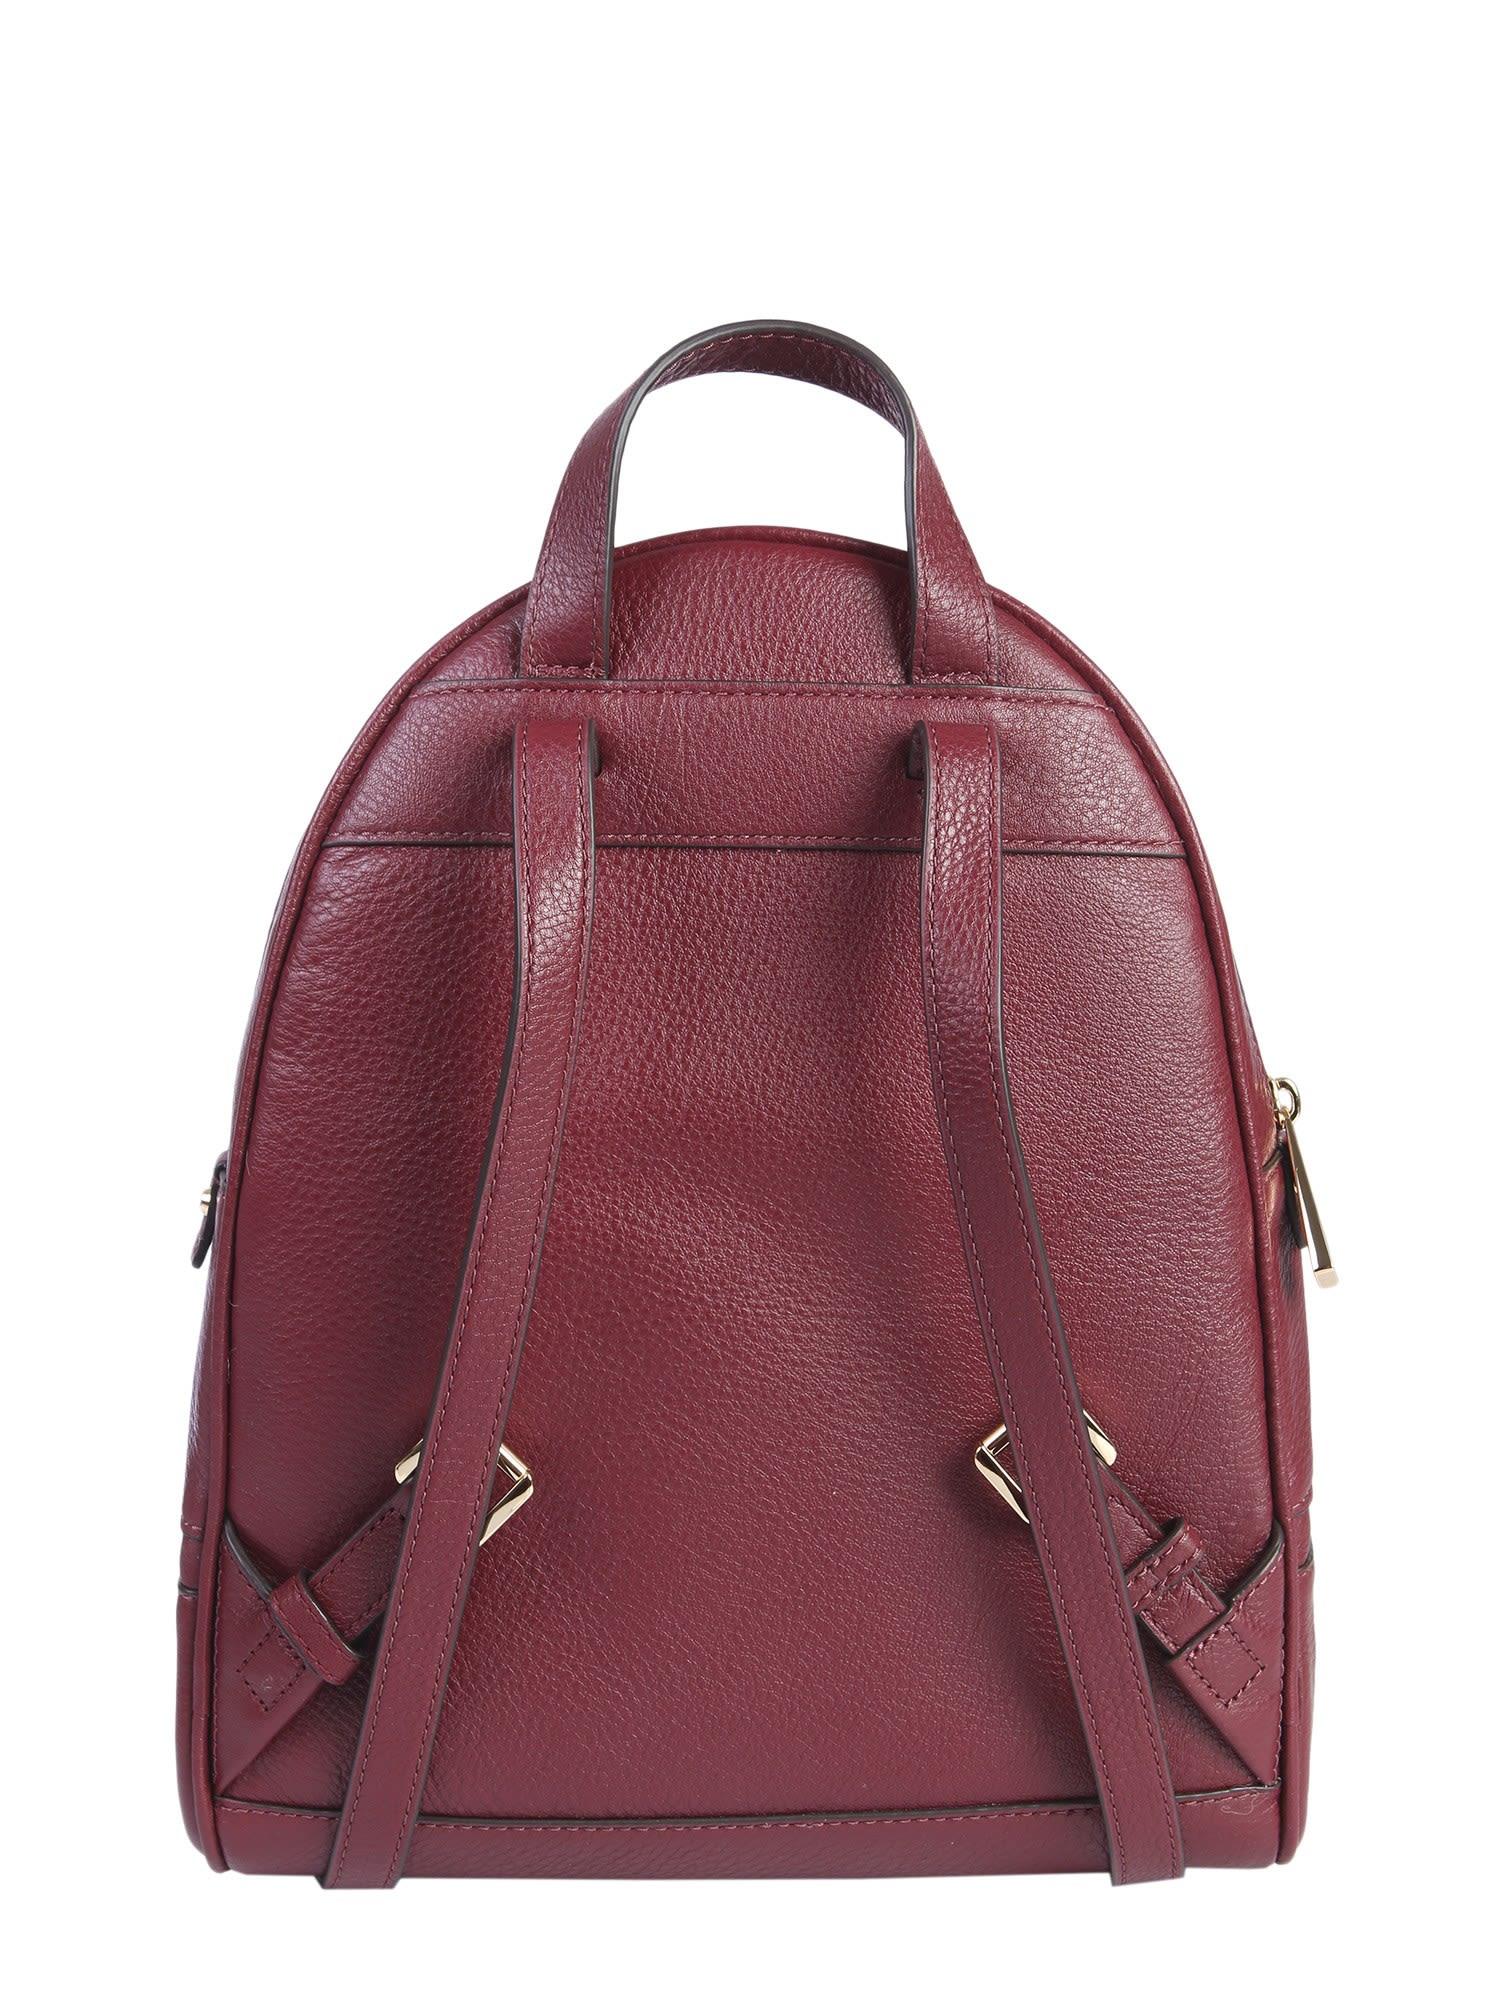 a35c853091c54 MICHAEL Michael Kors MICHAEL Michael Kors Medium Rhea Zip Backpack ...